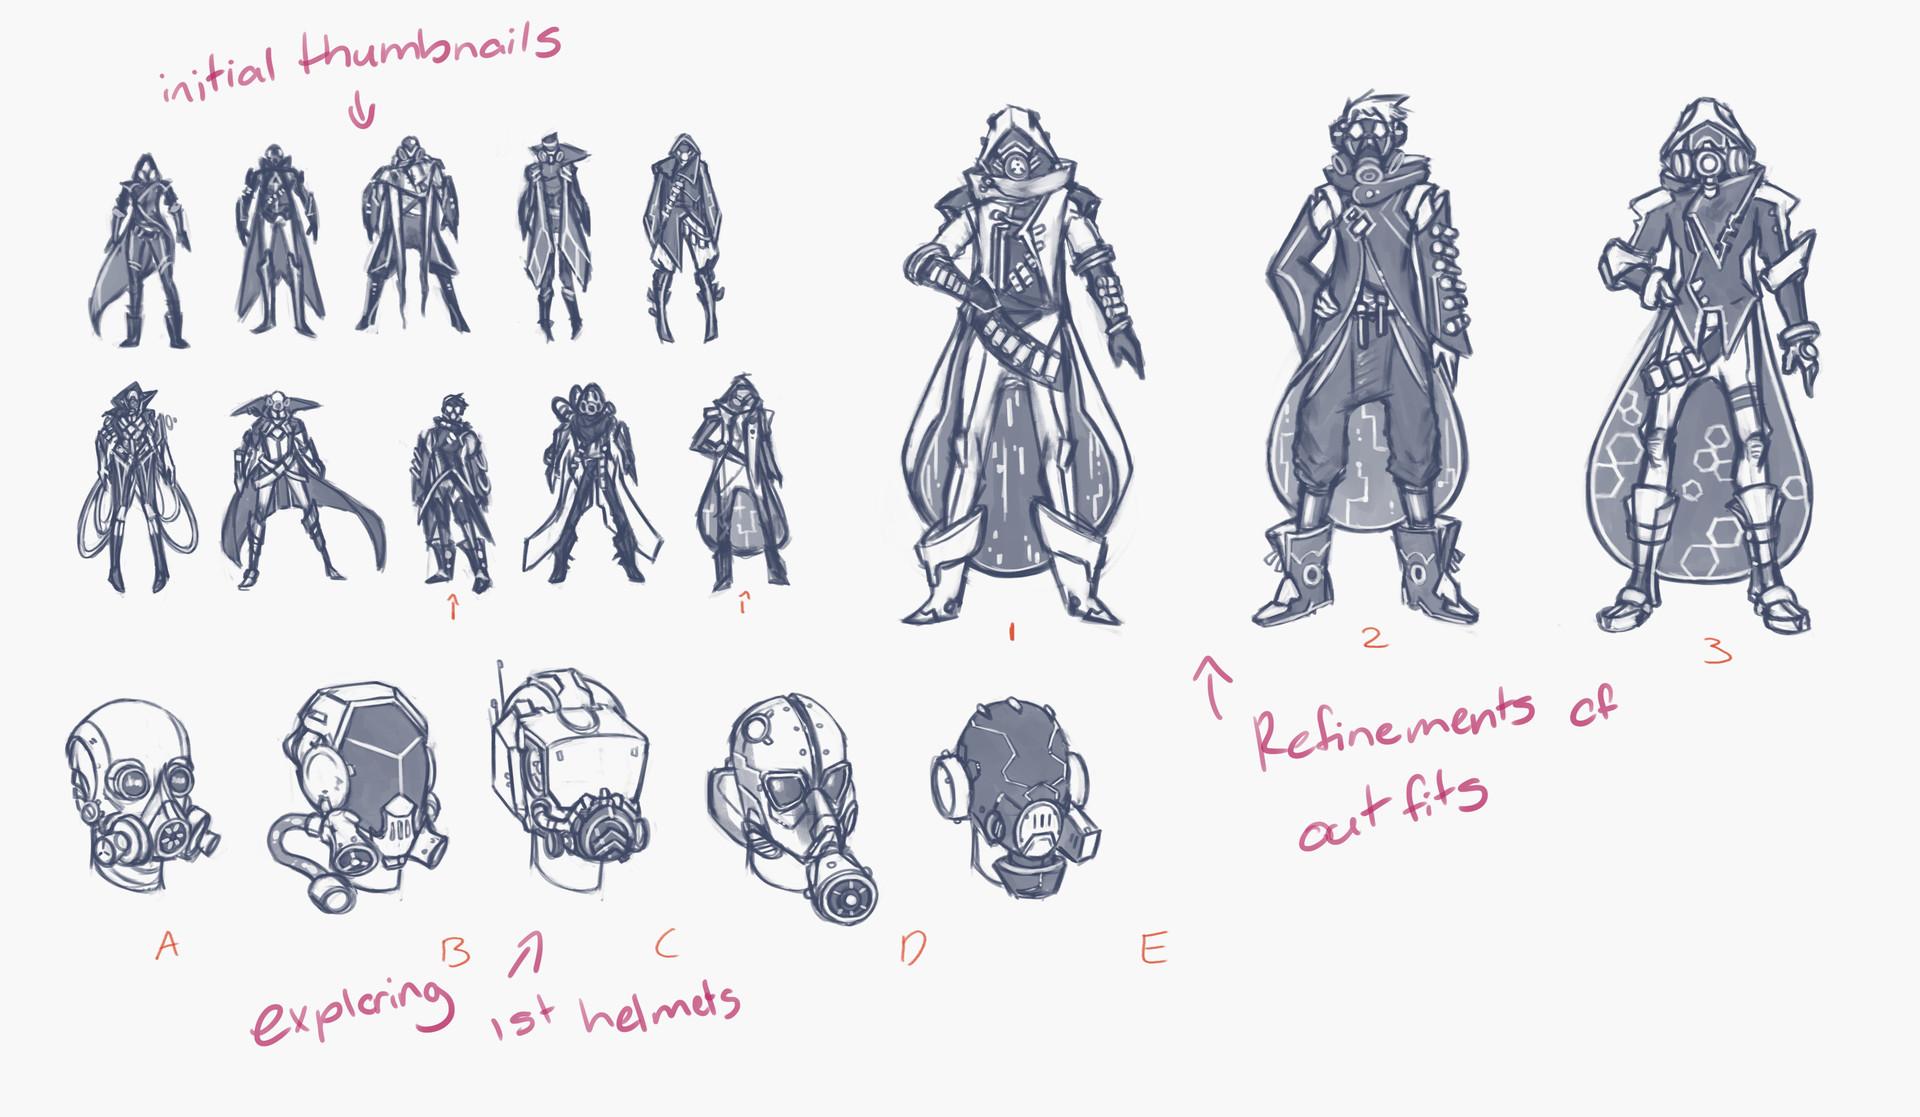 Initial Concept idea